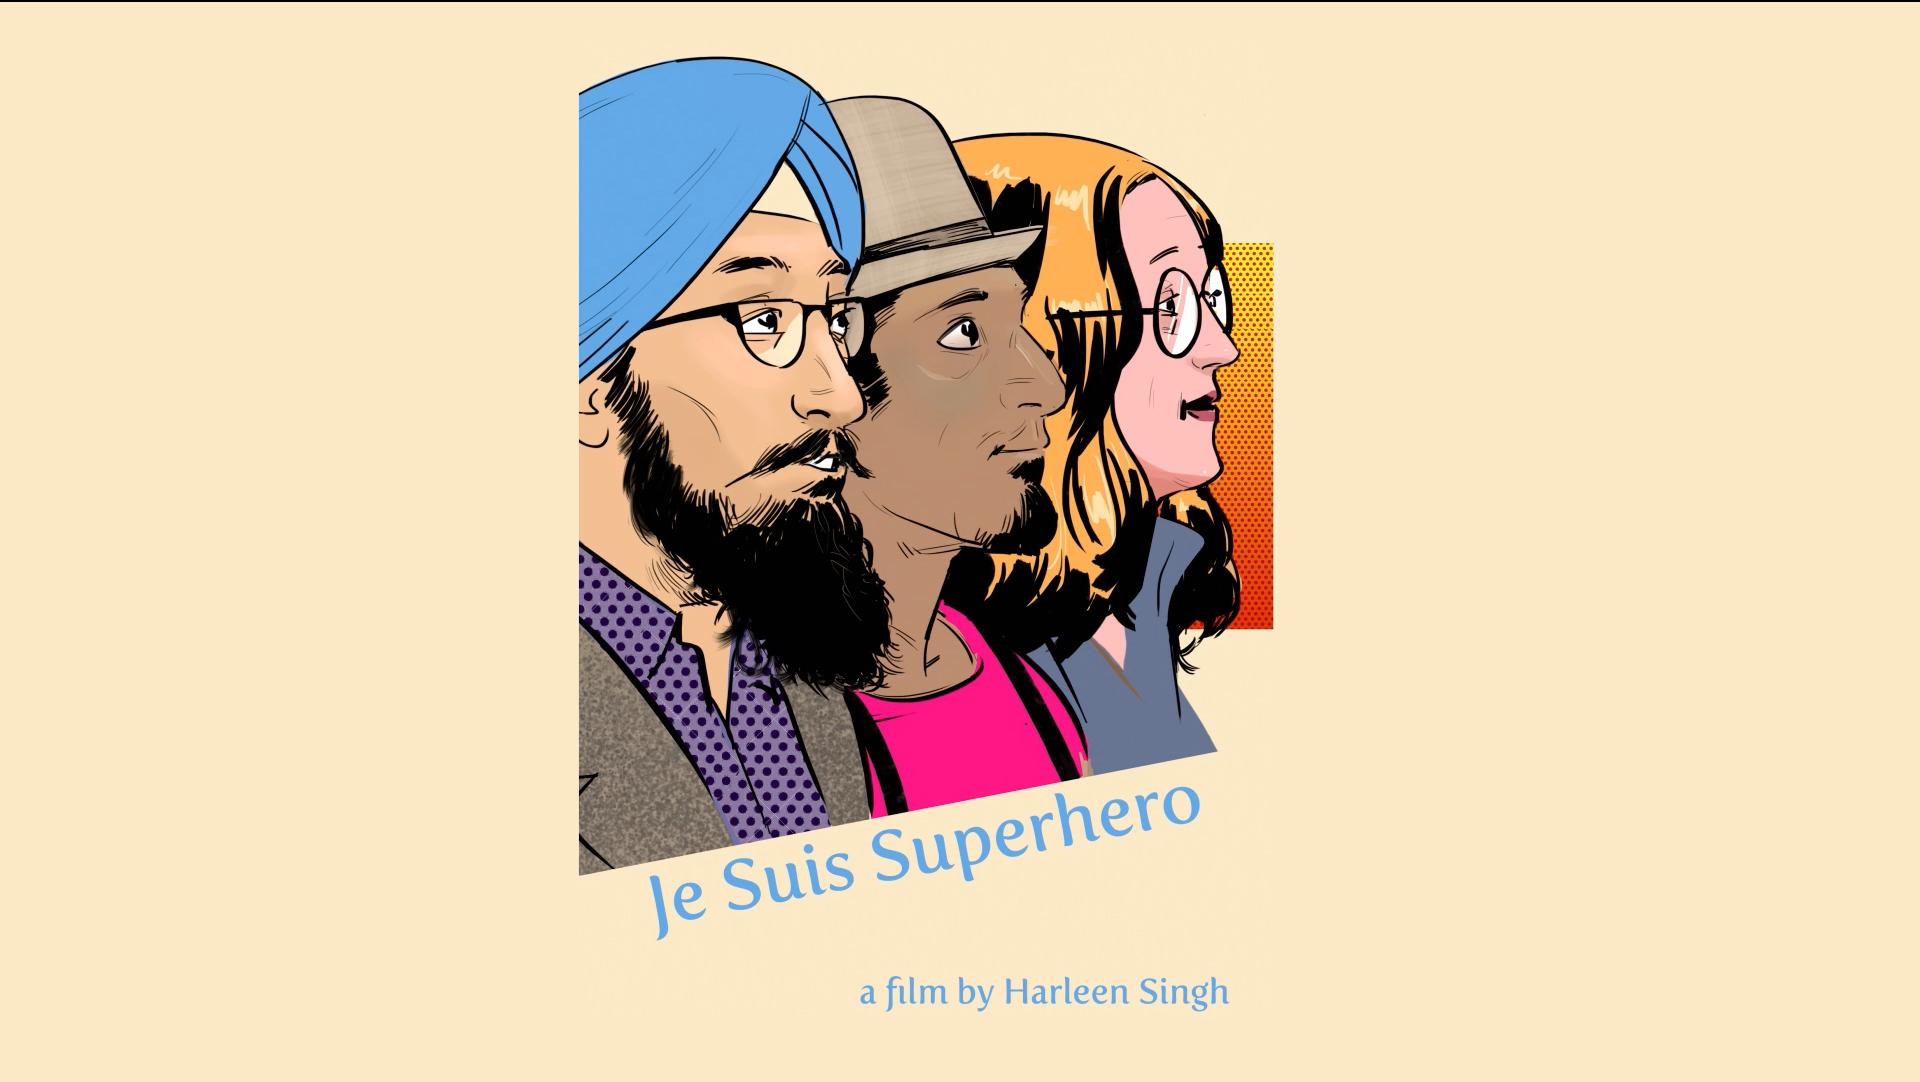 Je Suis Superhero Kickstarter